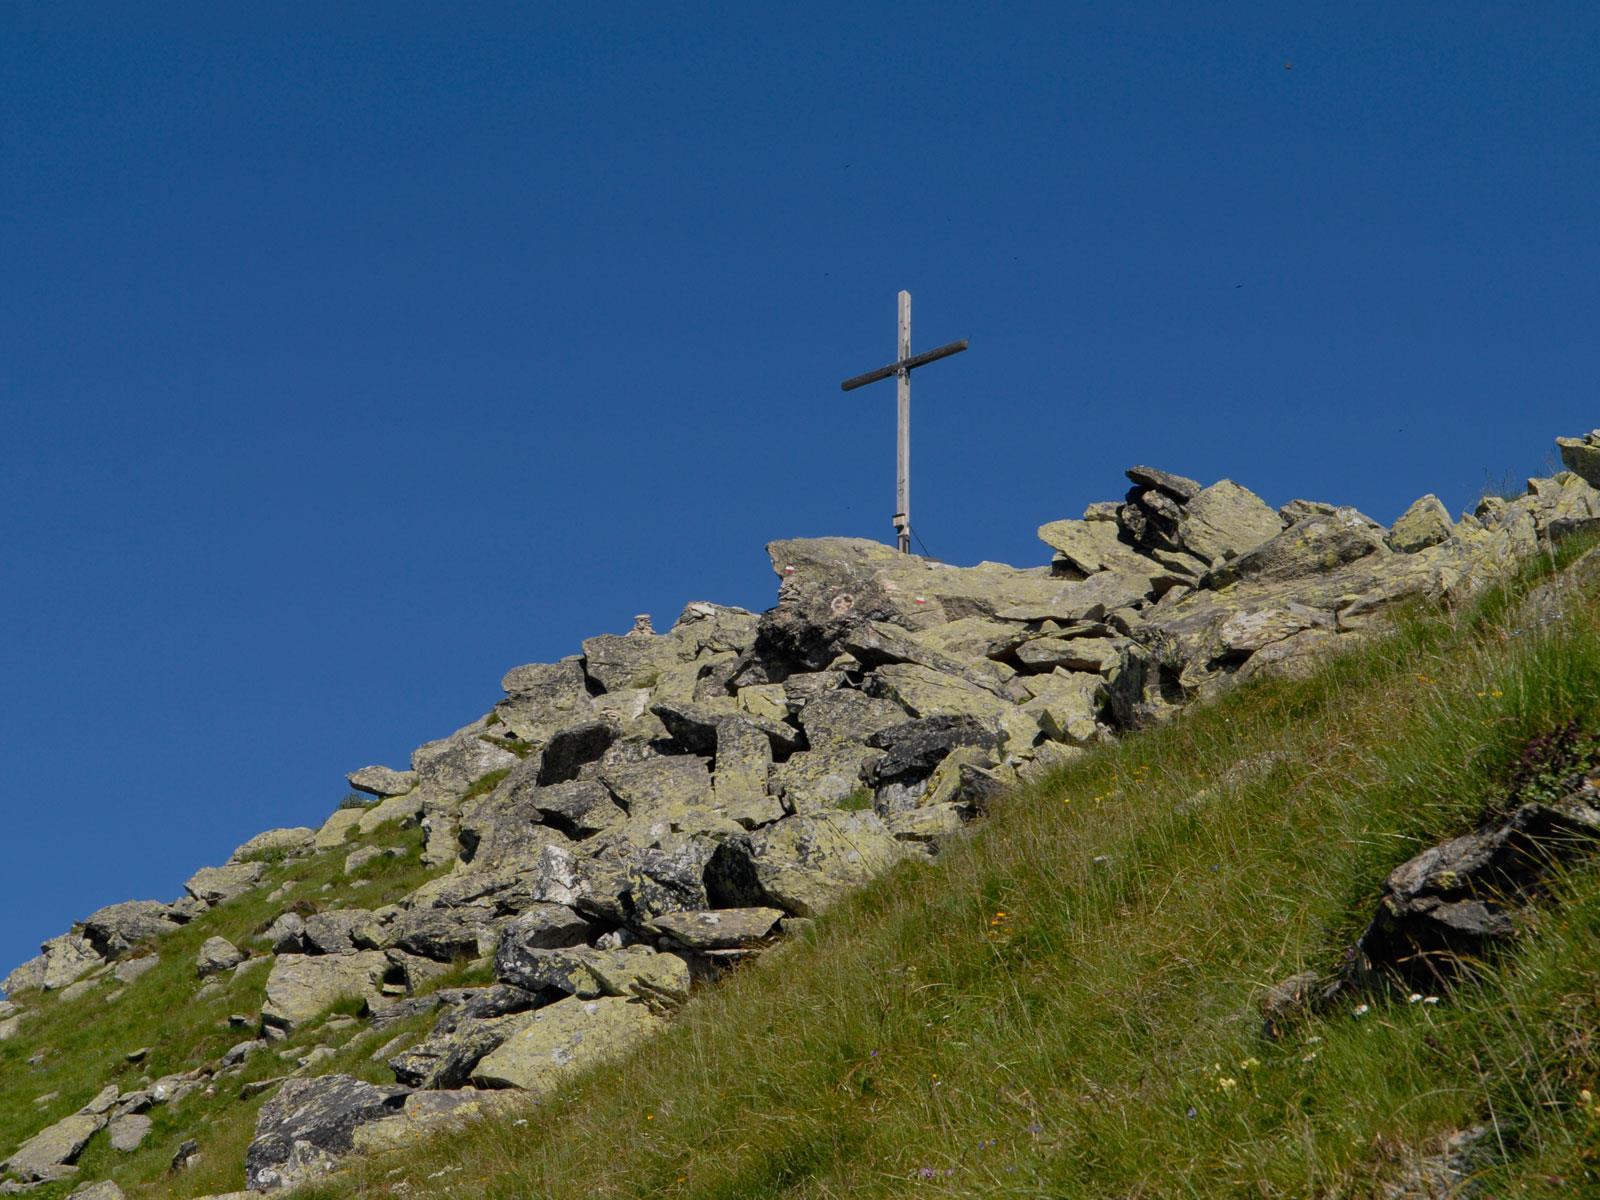 Alpine Tour to the Mutspitze Mountain